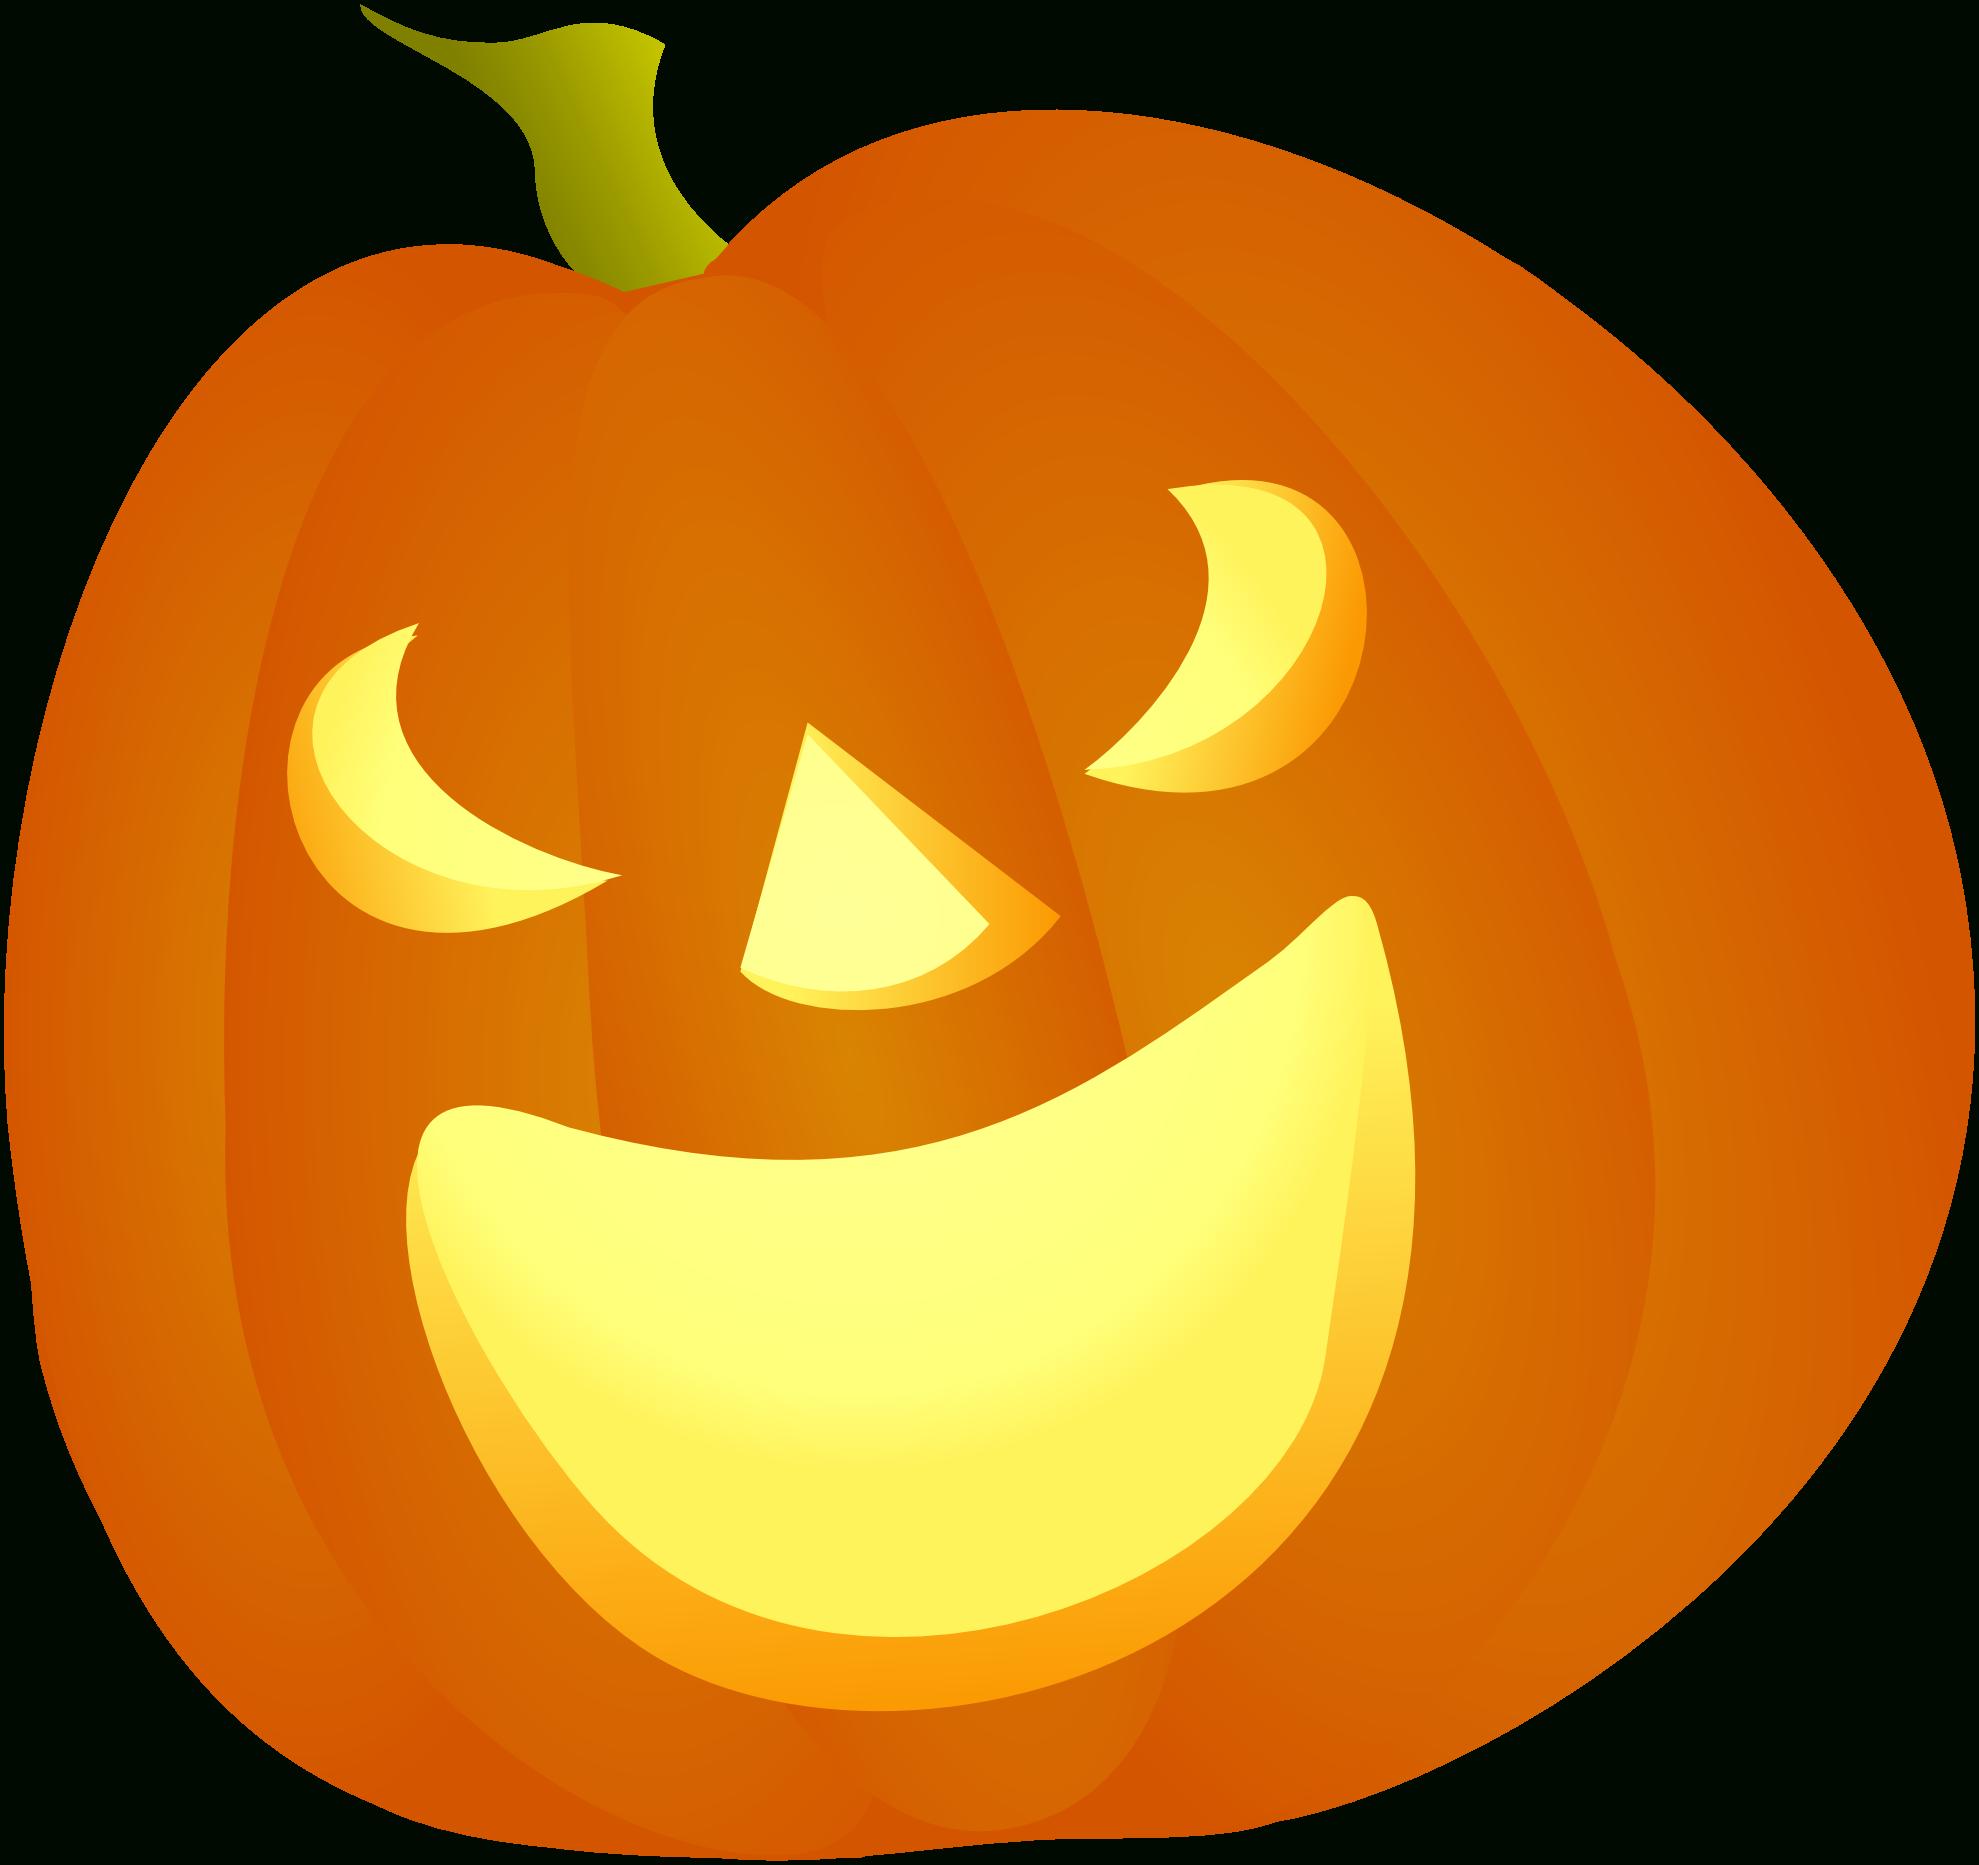 Cute halloween png cyberuse. Pumpkin clipart simple